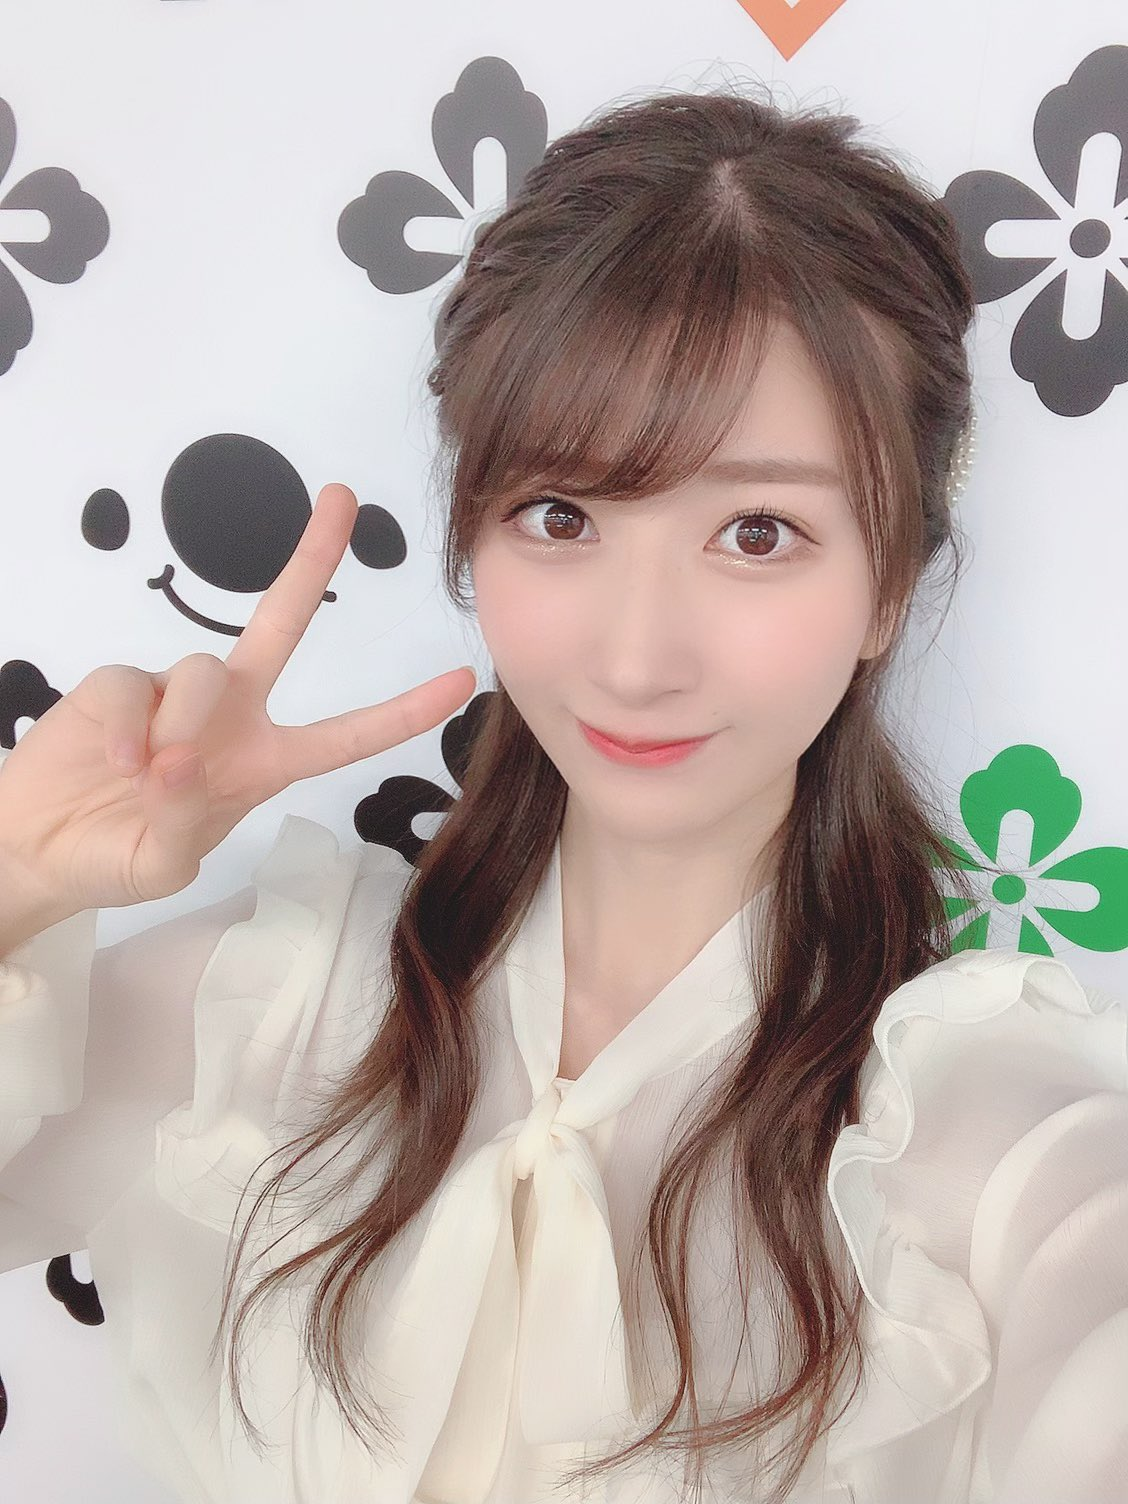 AKB48タイムズ(AKB48まとめ) : 石田晴香 - livedoor Blog(ブログ)